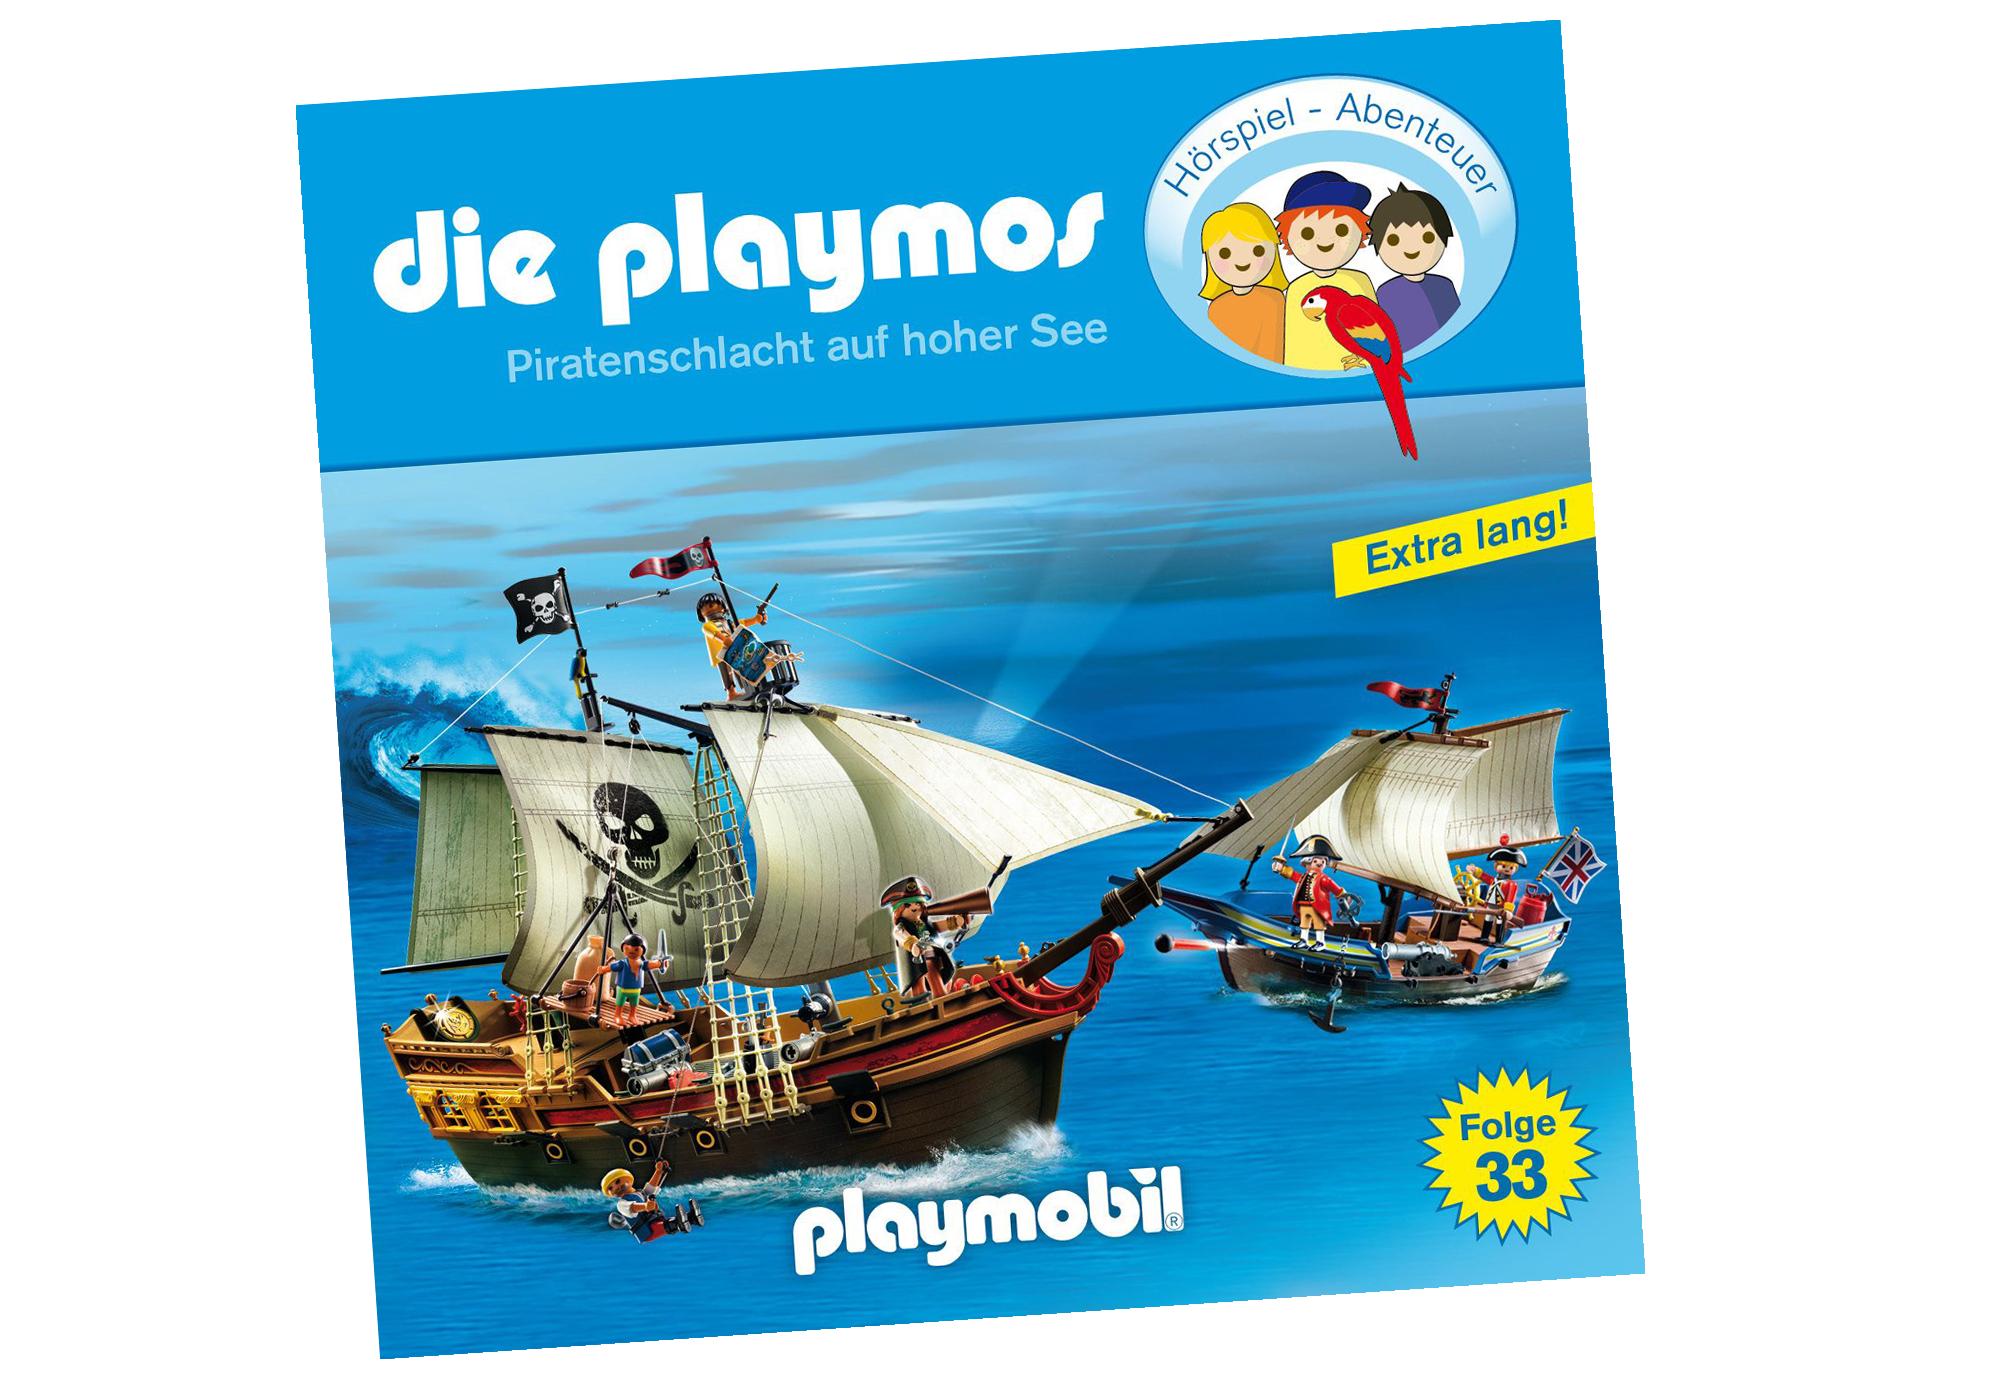 http://media.playmobil.com/i/playmobil/80444_product_detail